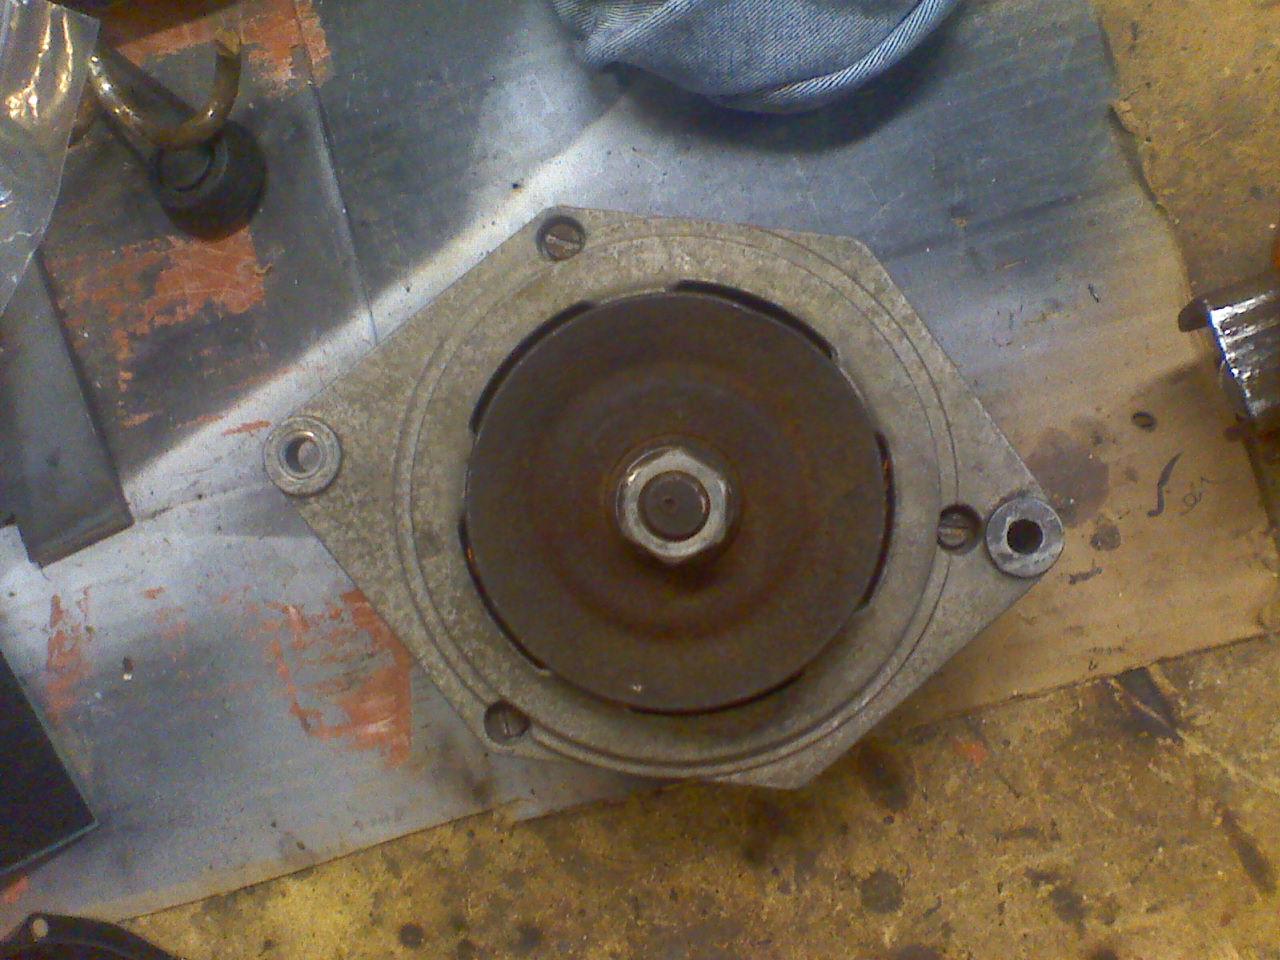 What alternator?  55amp or 70amp?